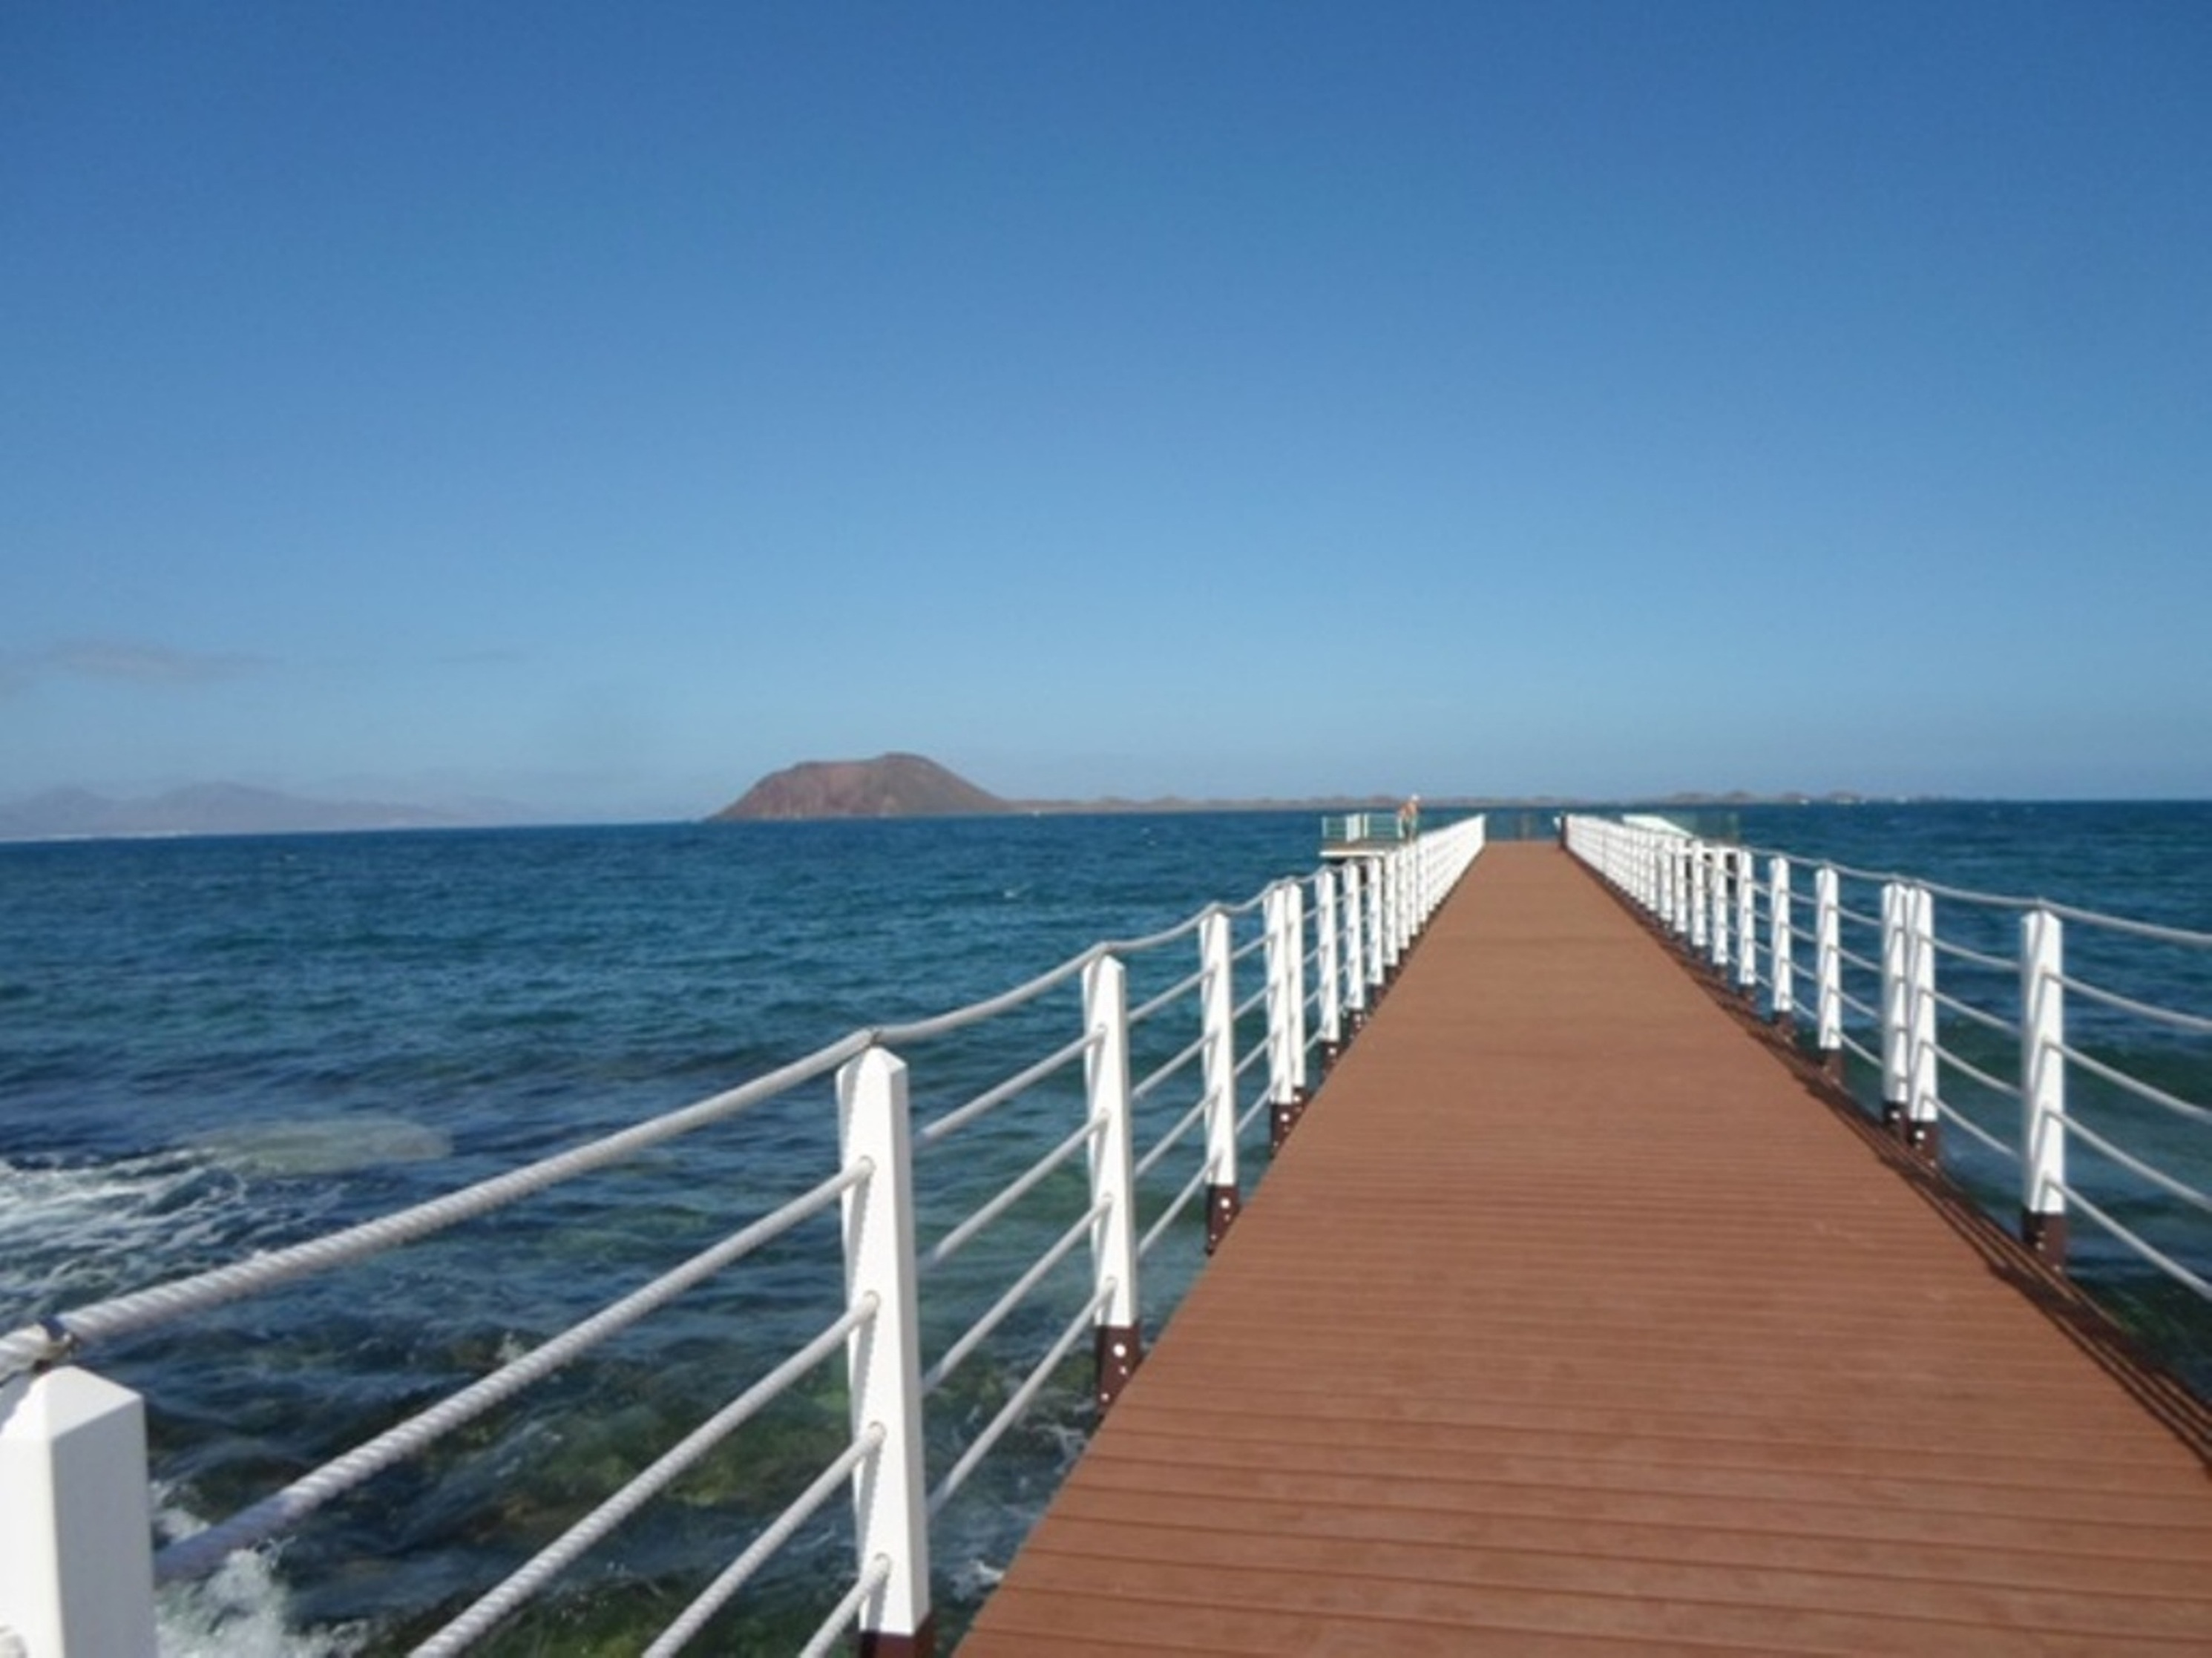 Ferienwohnung Wohnung El Mirador -Residencial Las Dunas - (2196686), Corralejo, Fuerteventura, Kanarische Inseln, Spanien, Bild 17